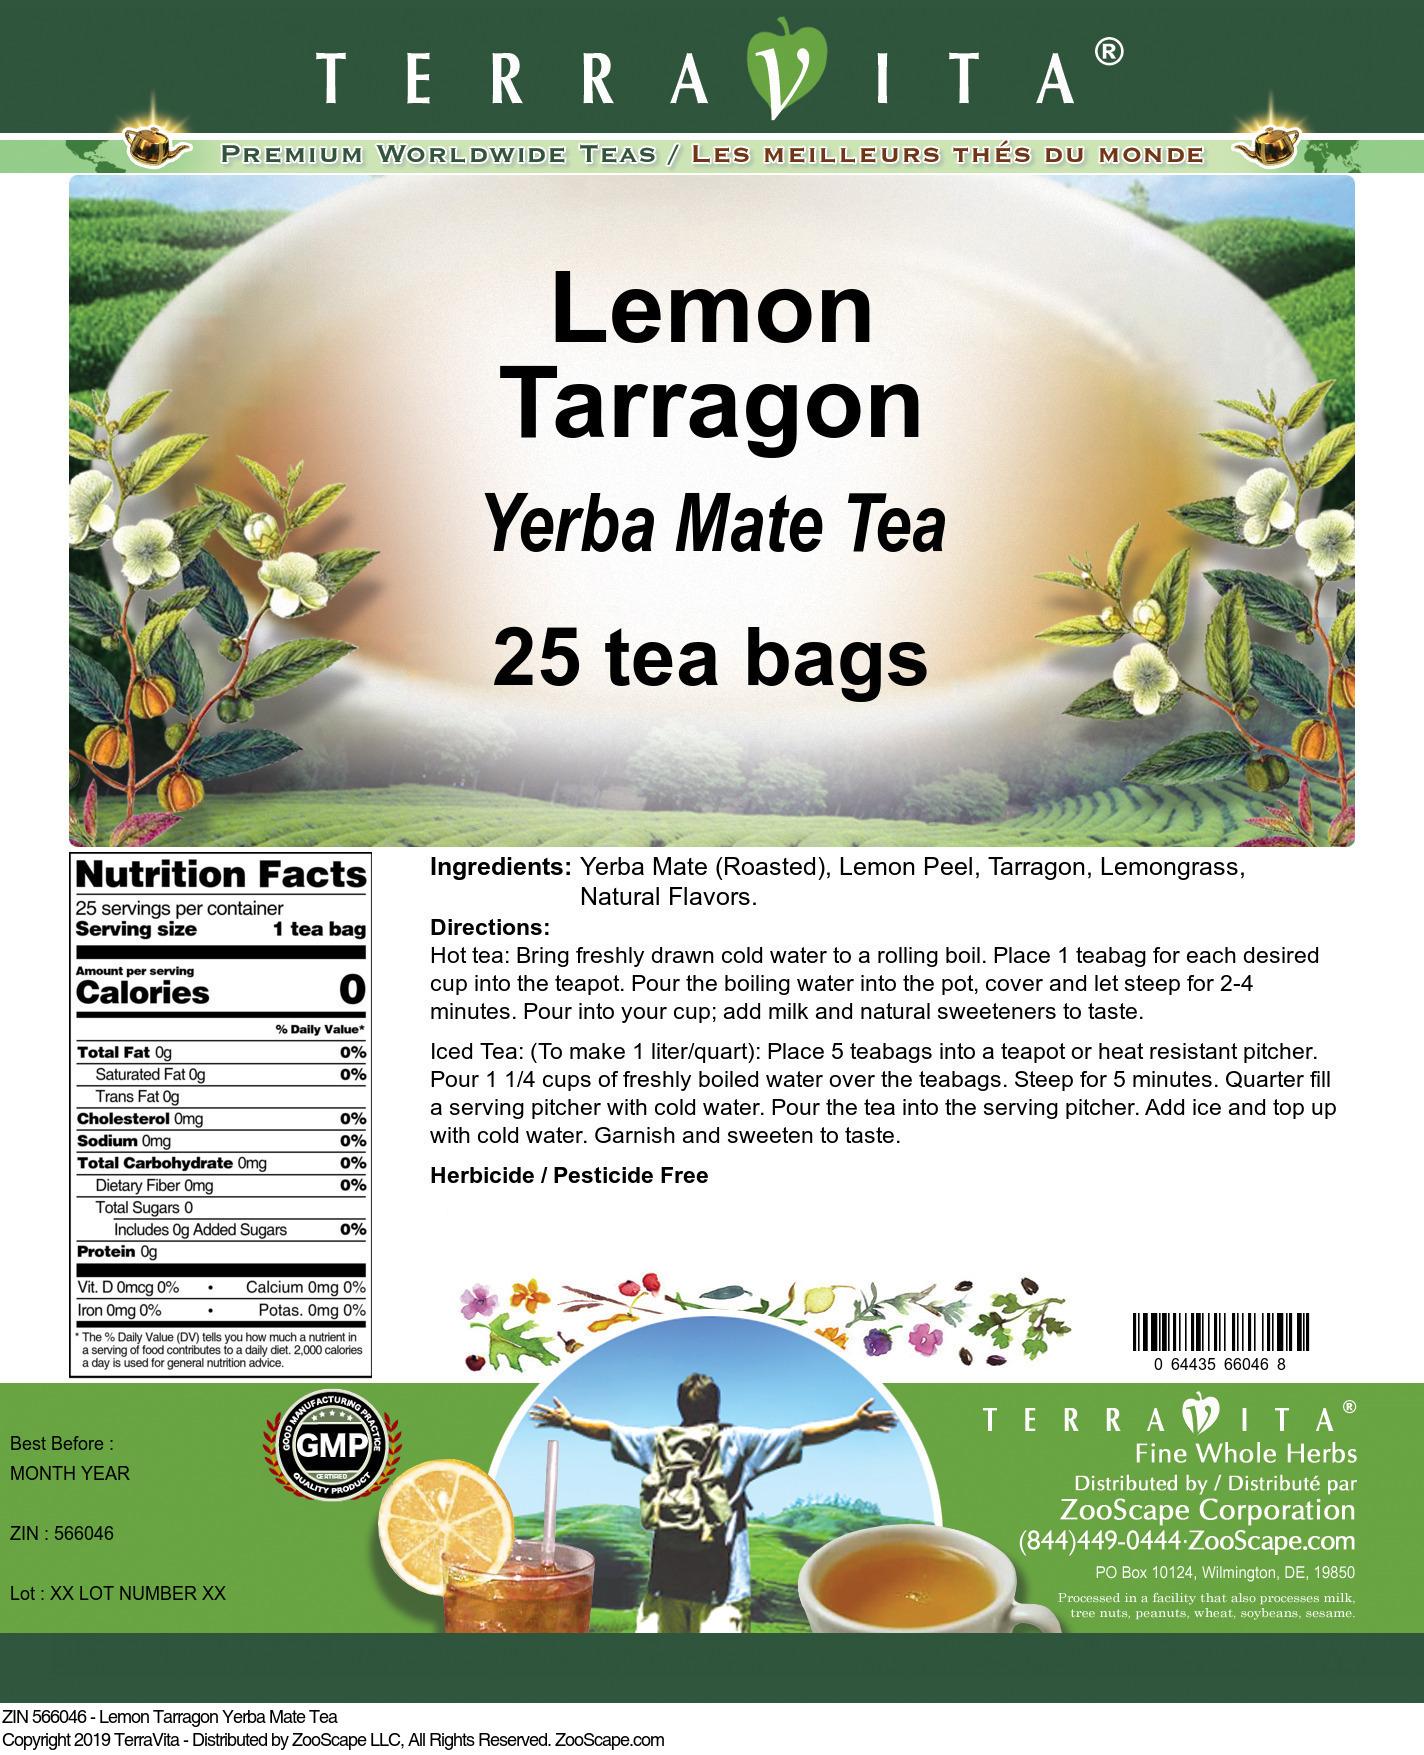 Lemon Tarragon Yerba Mate